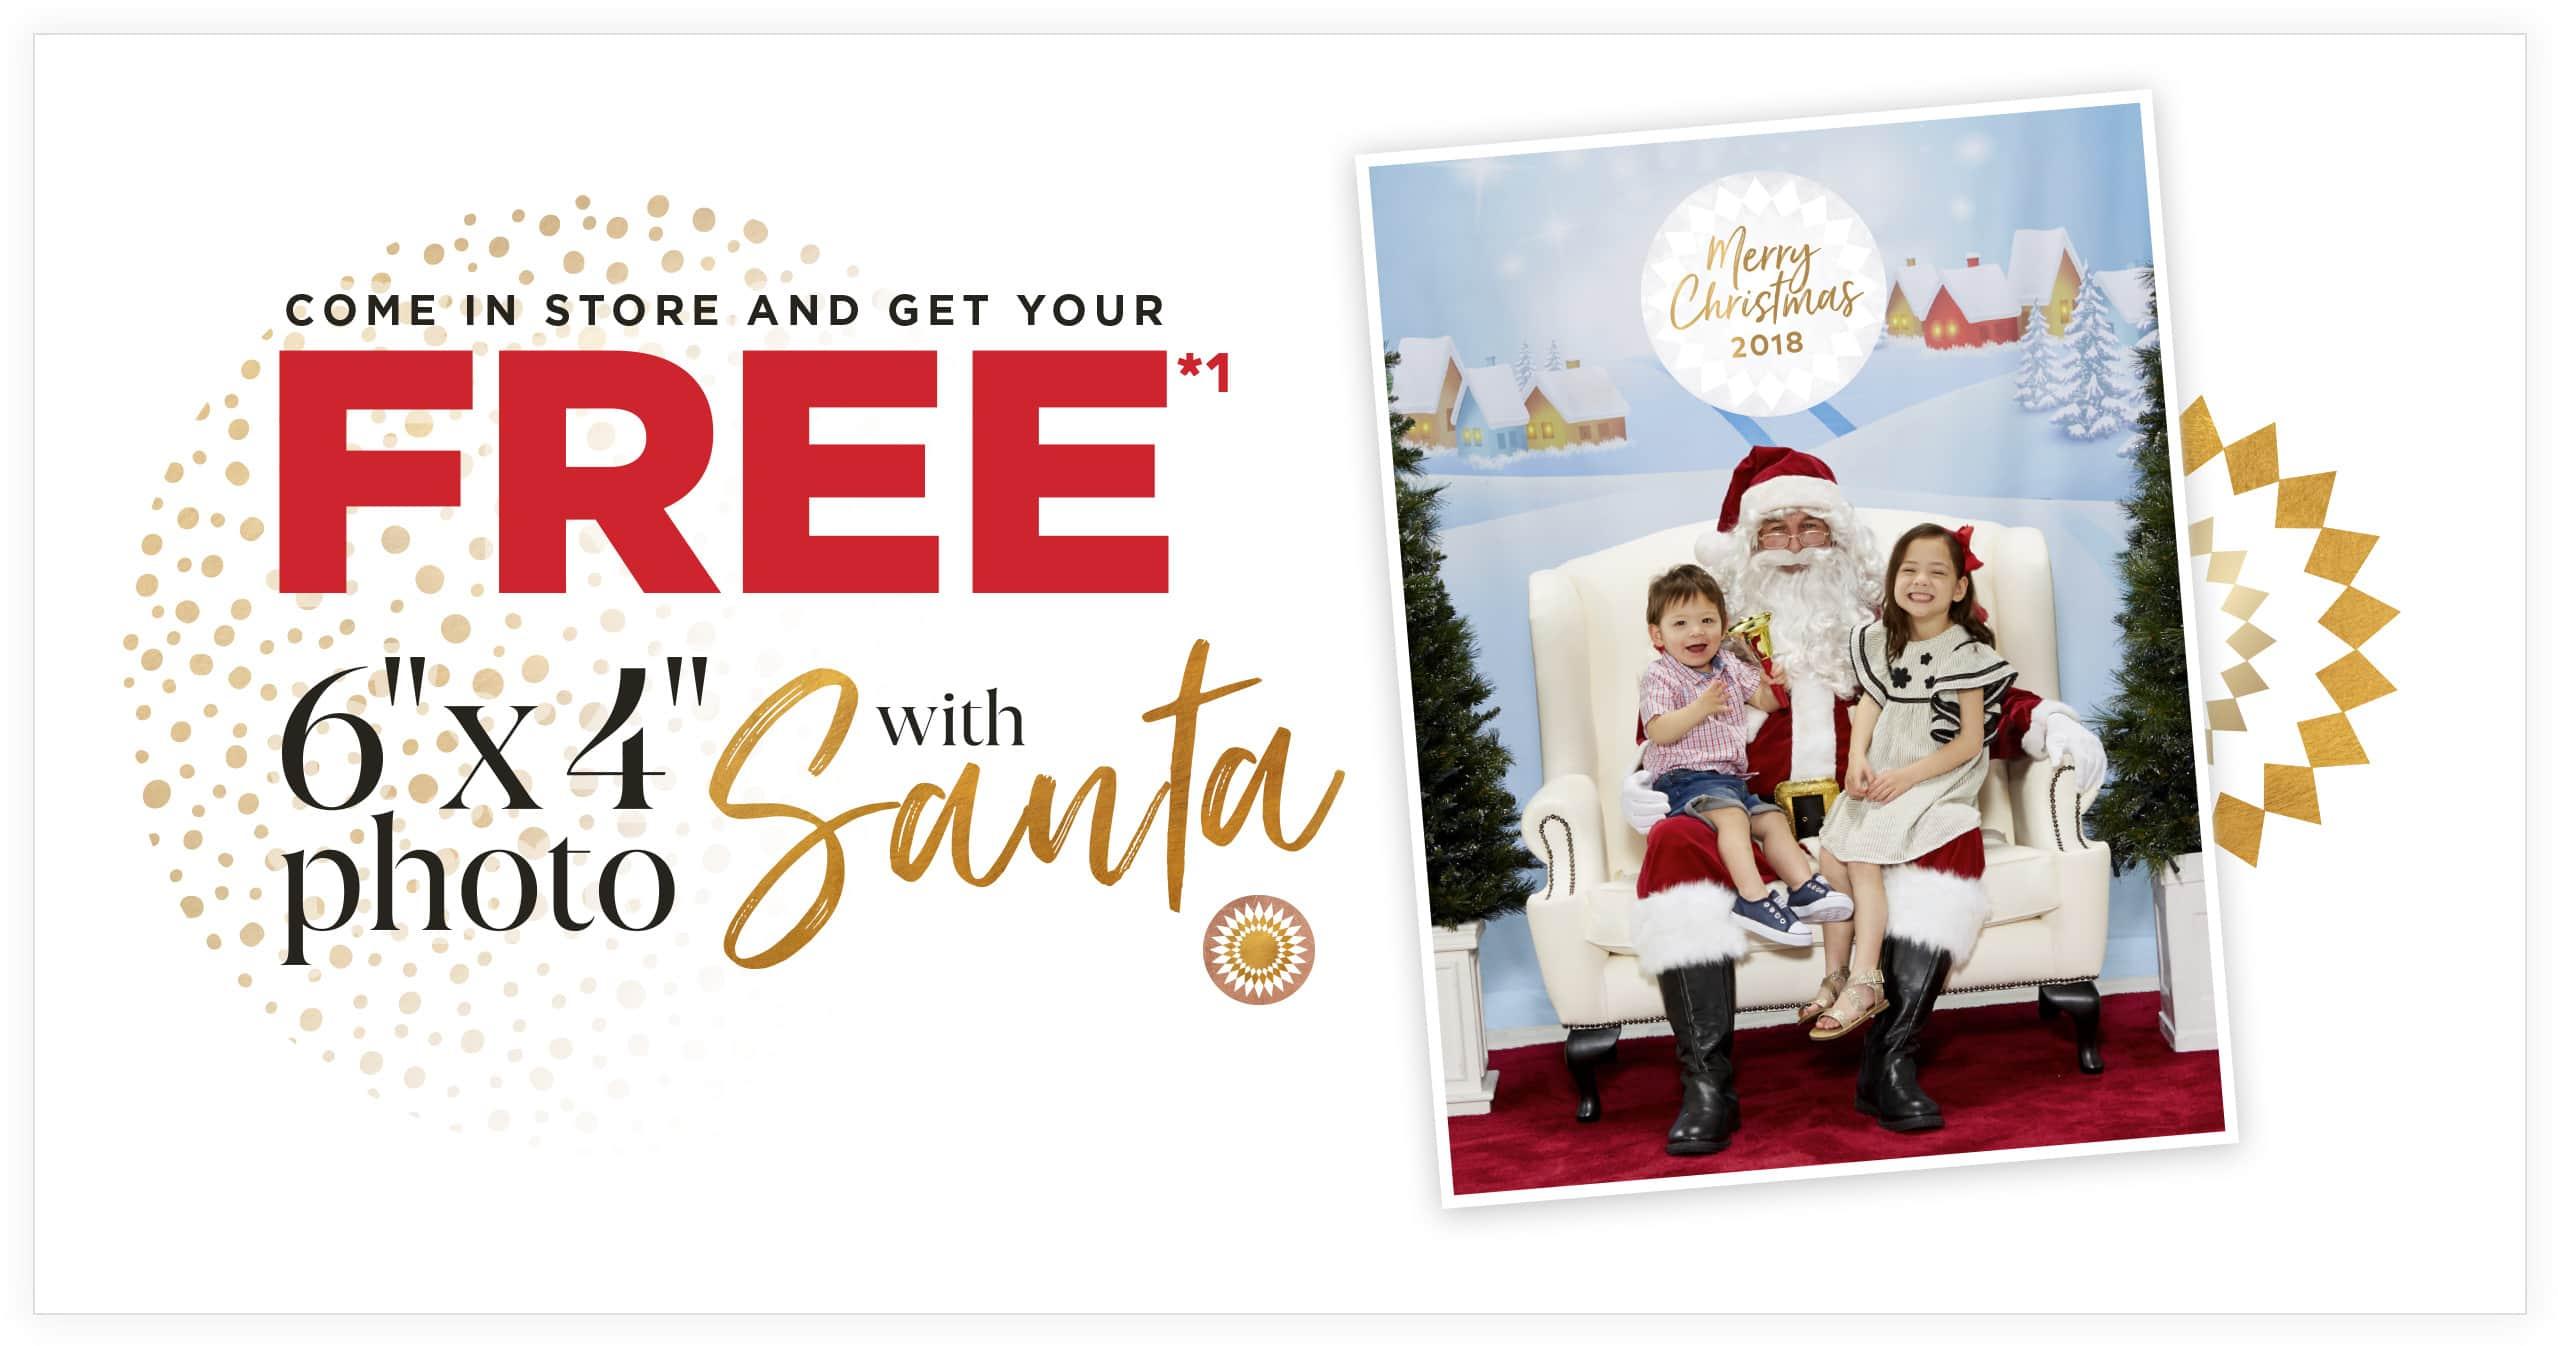 Free 6x4 photo with santa